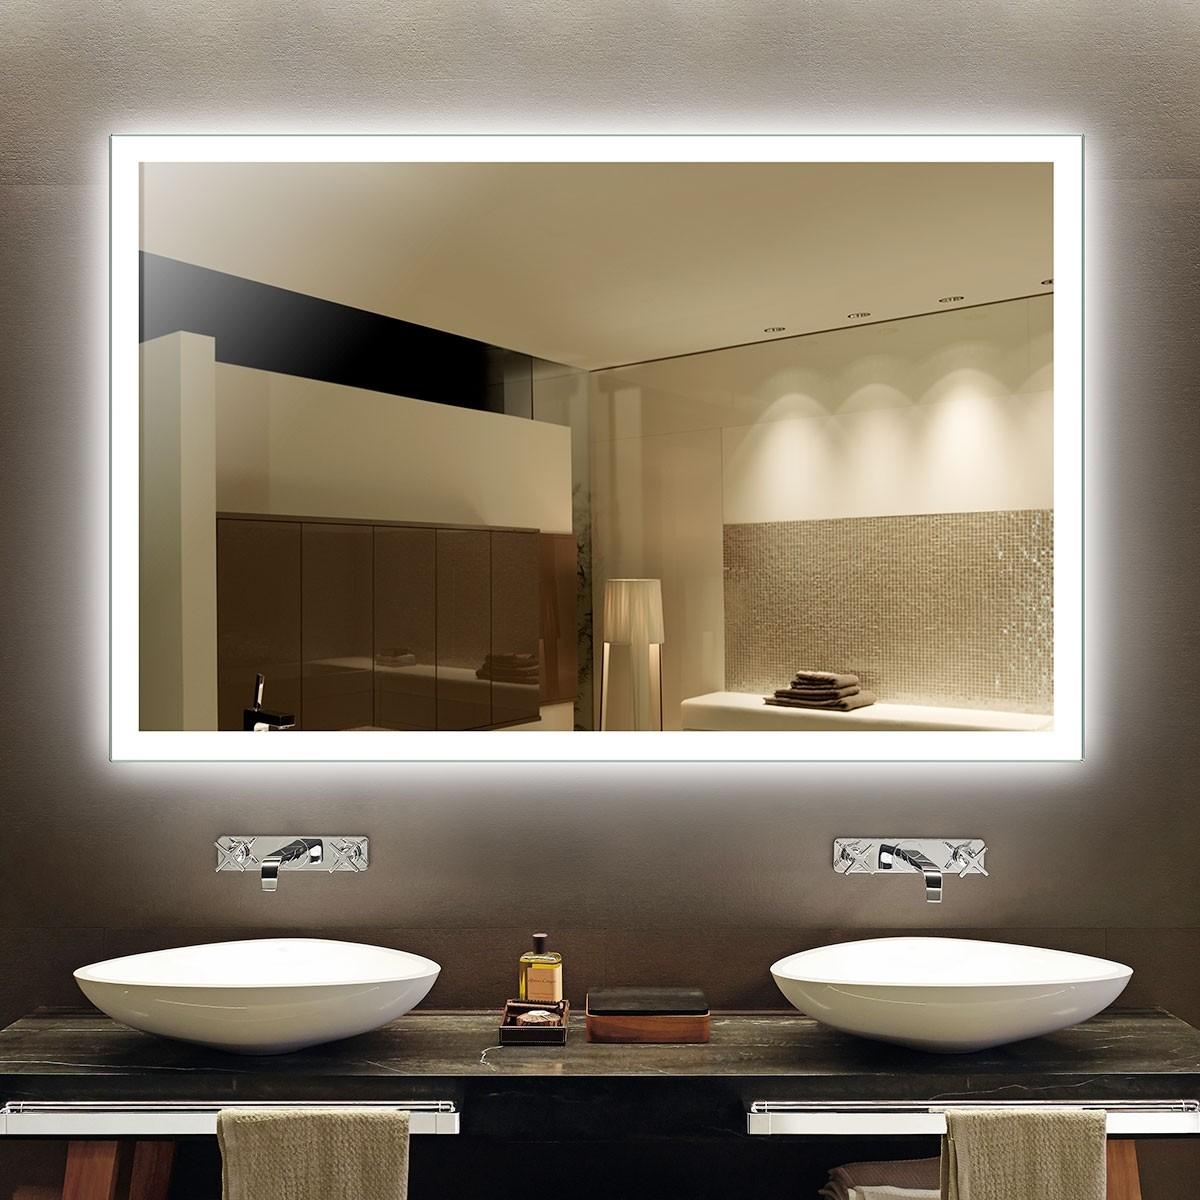 Decoraport 55 x 36 In LED Bathroom Mirror with Infrared Sensor Control, Anti-Fog, Vertical & Horizontal Mount (N031-5536-GS)